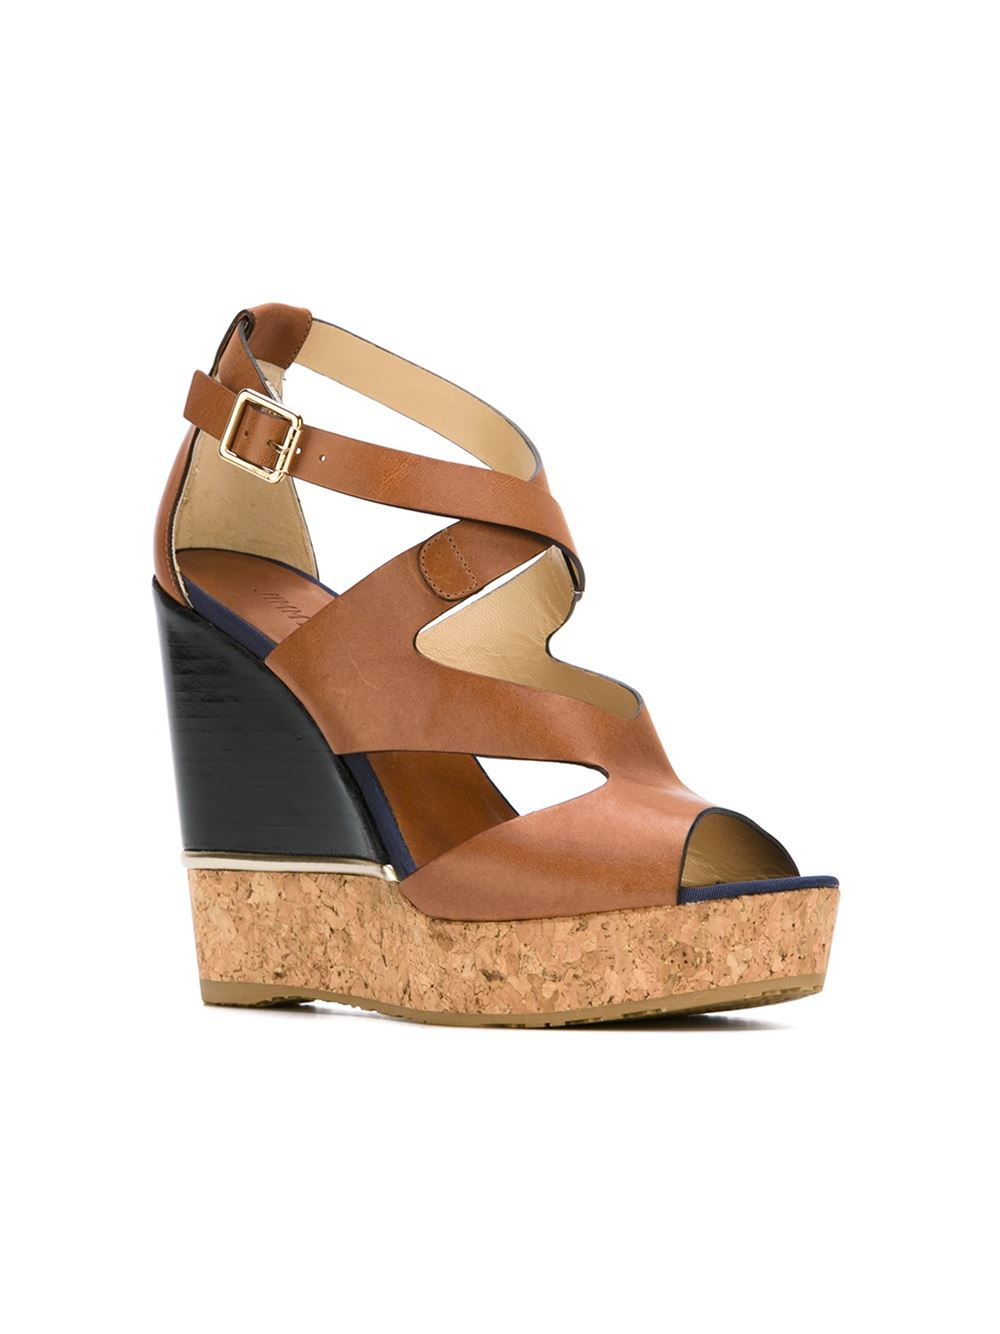 Jimmy Choo Shoes Black Brown Cork